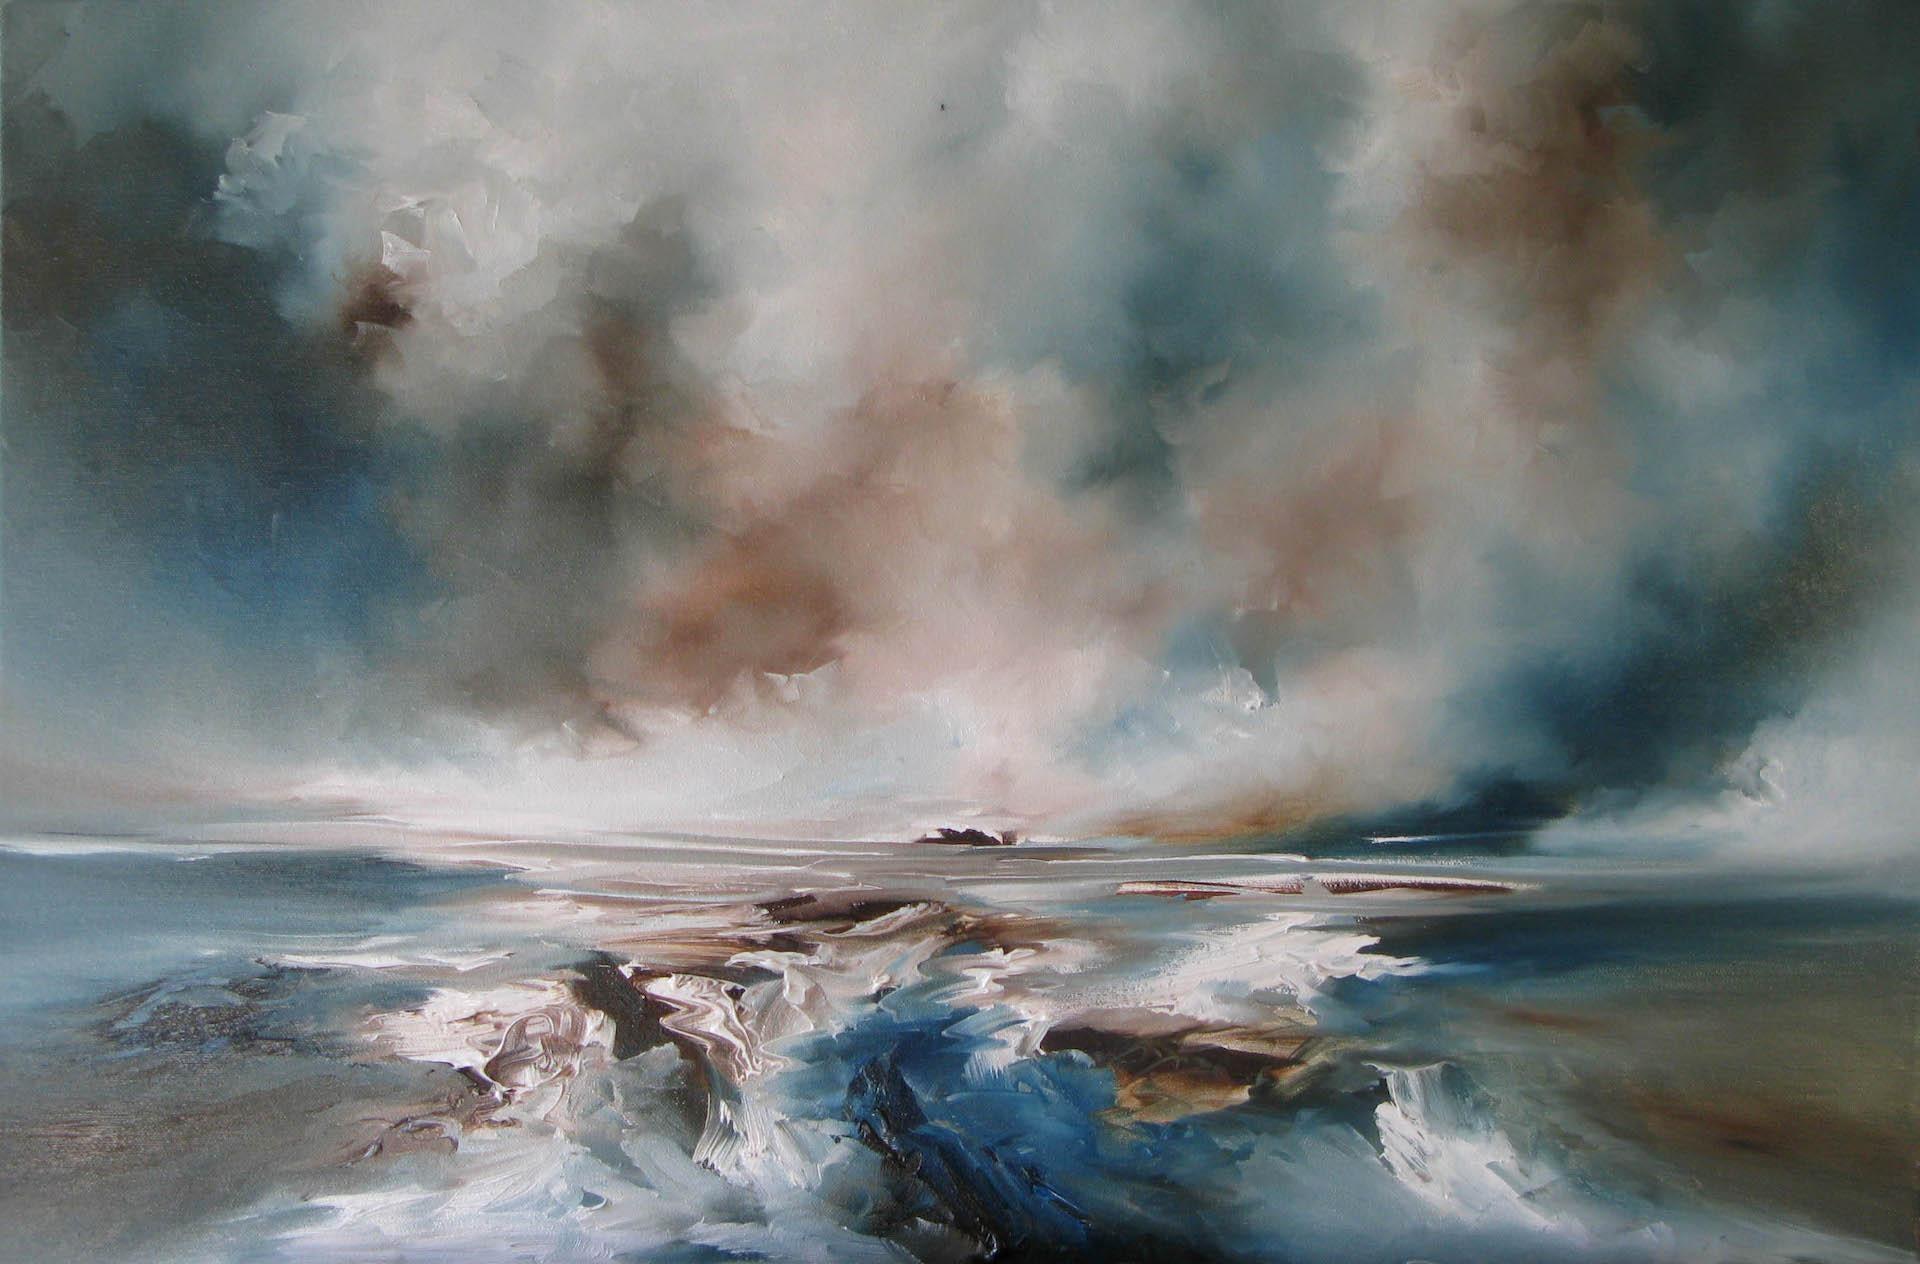 Distance, Alison Johnson, Original Seascape Painting,Contemporary Affordable Art